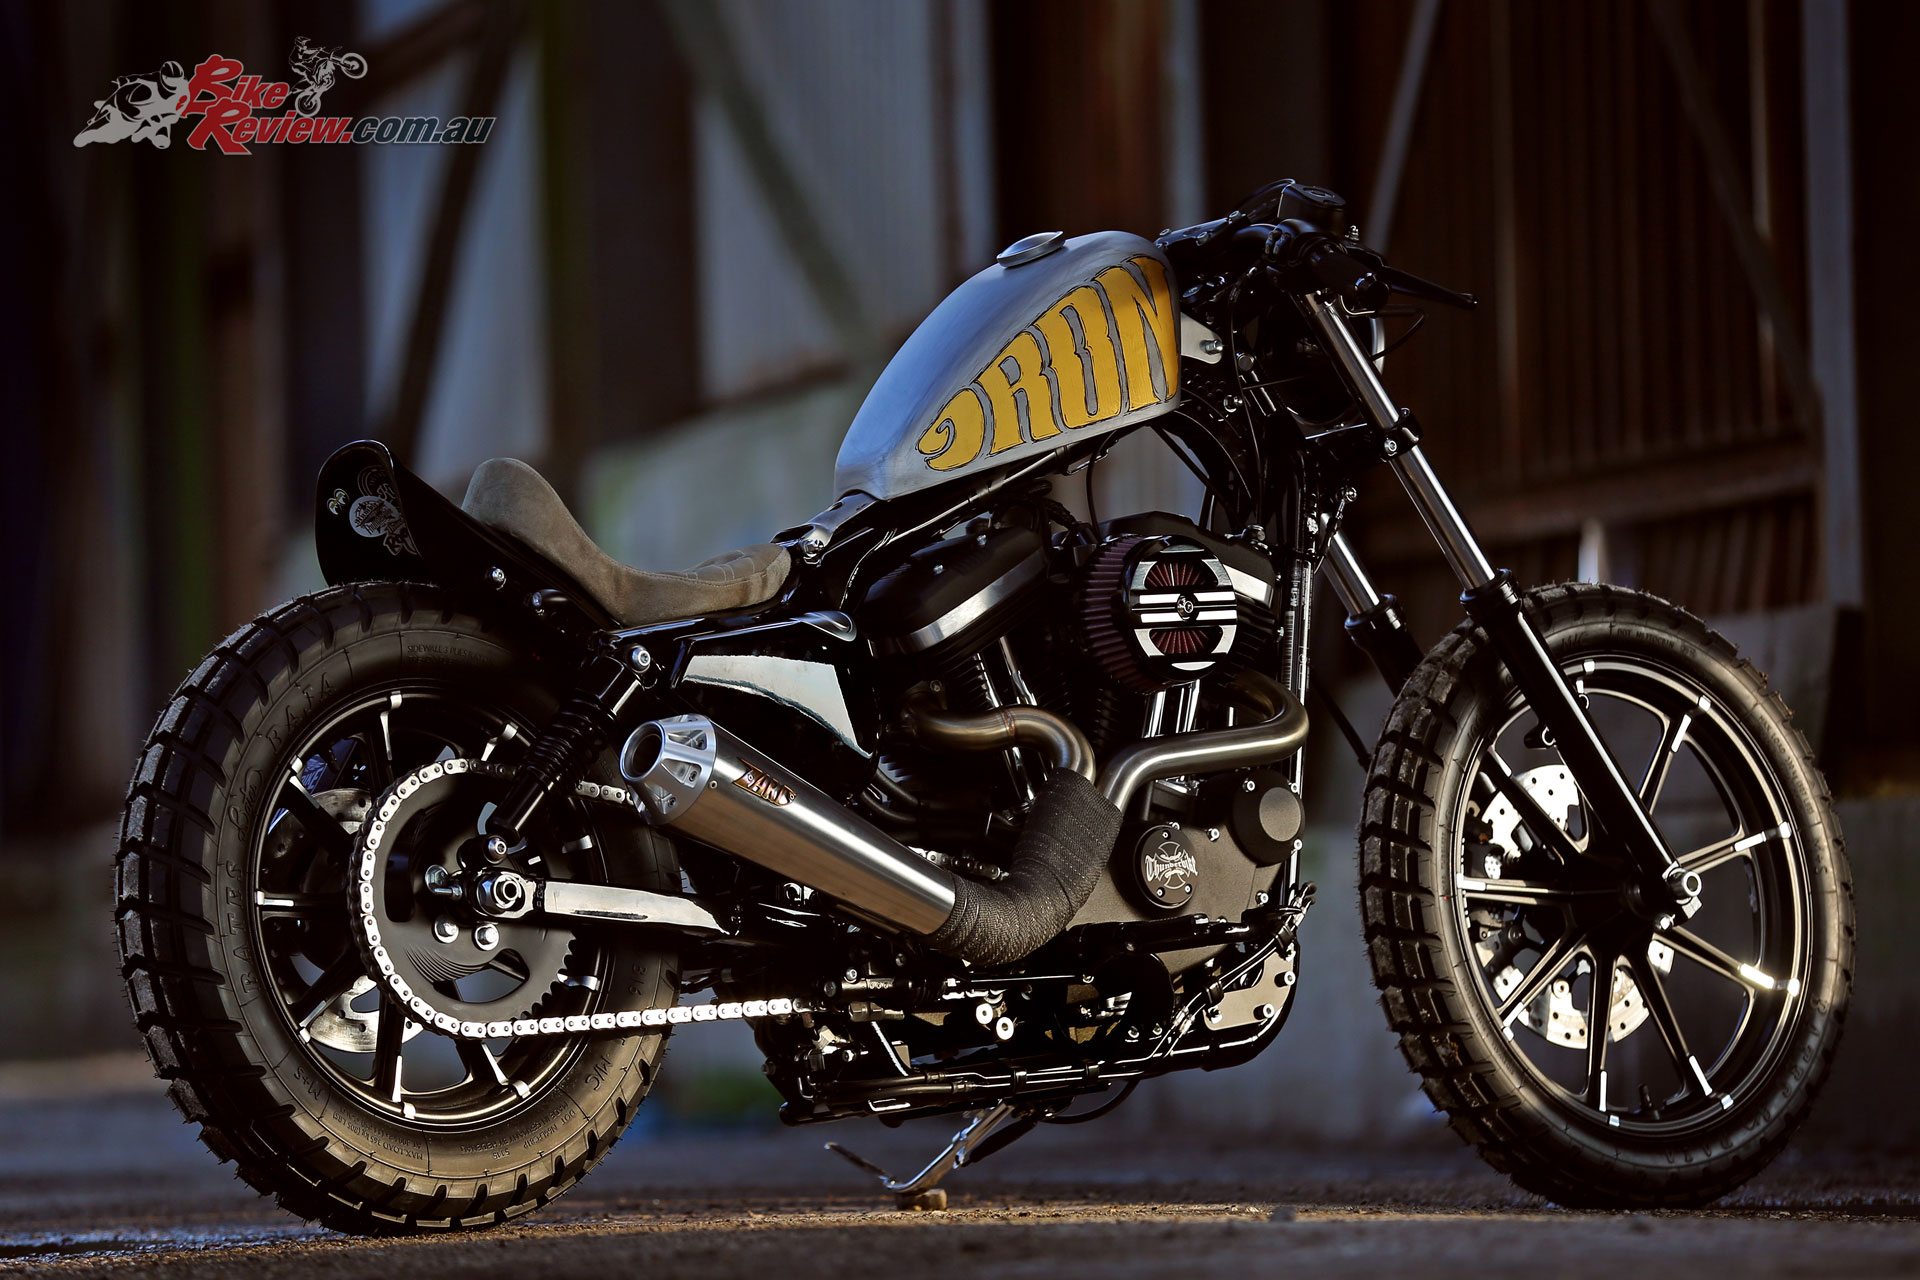 2017 Harley-Davidson - Battle of the Kings